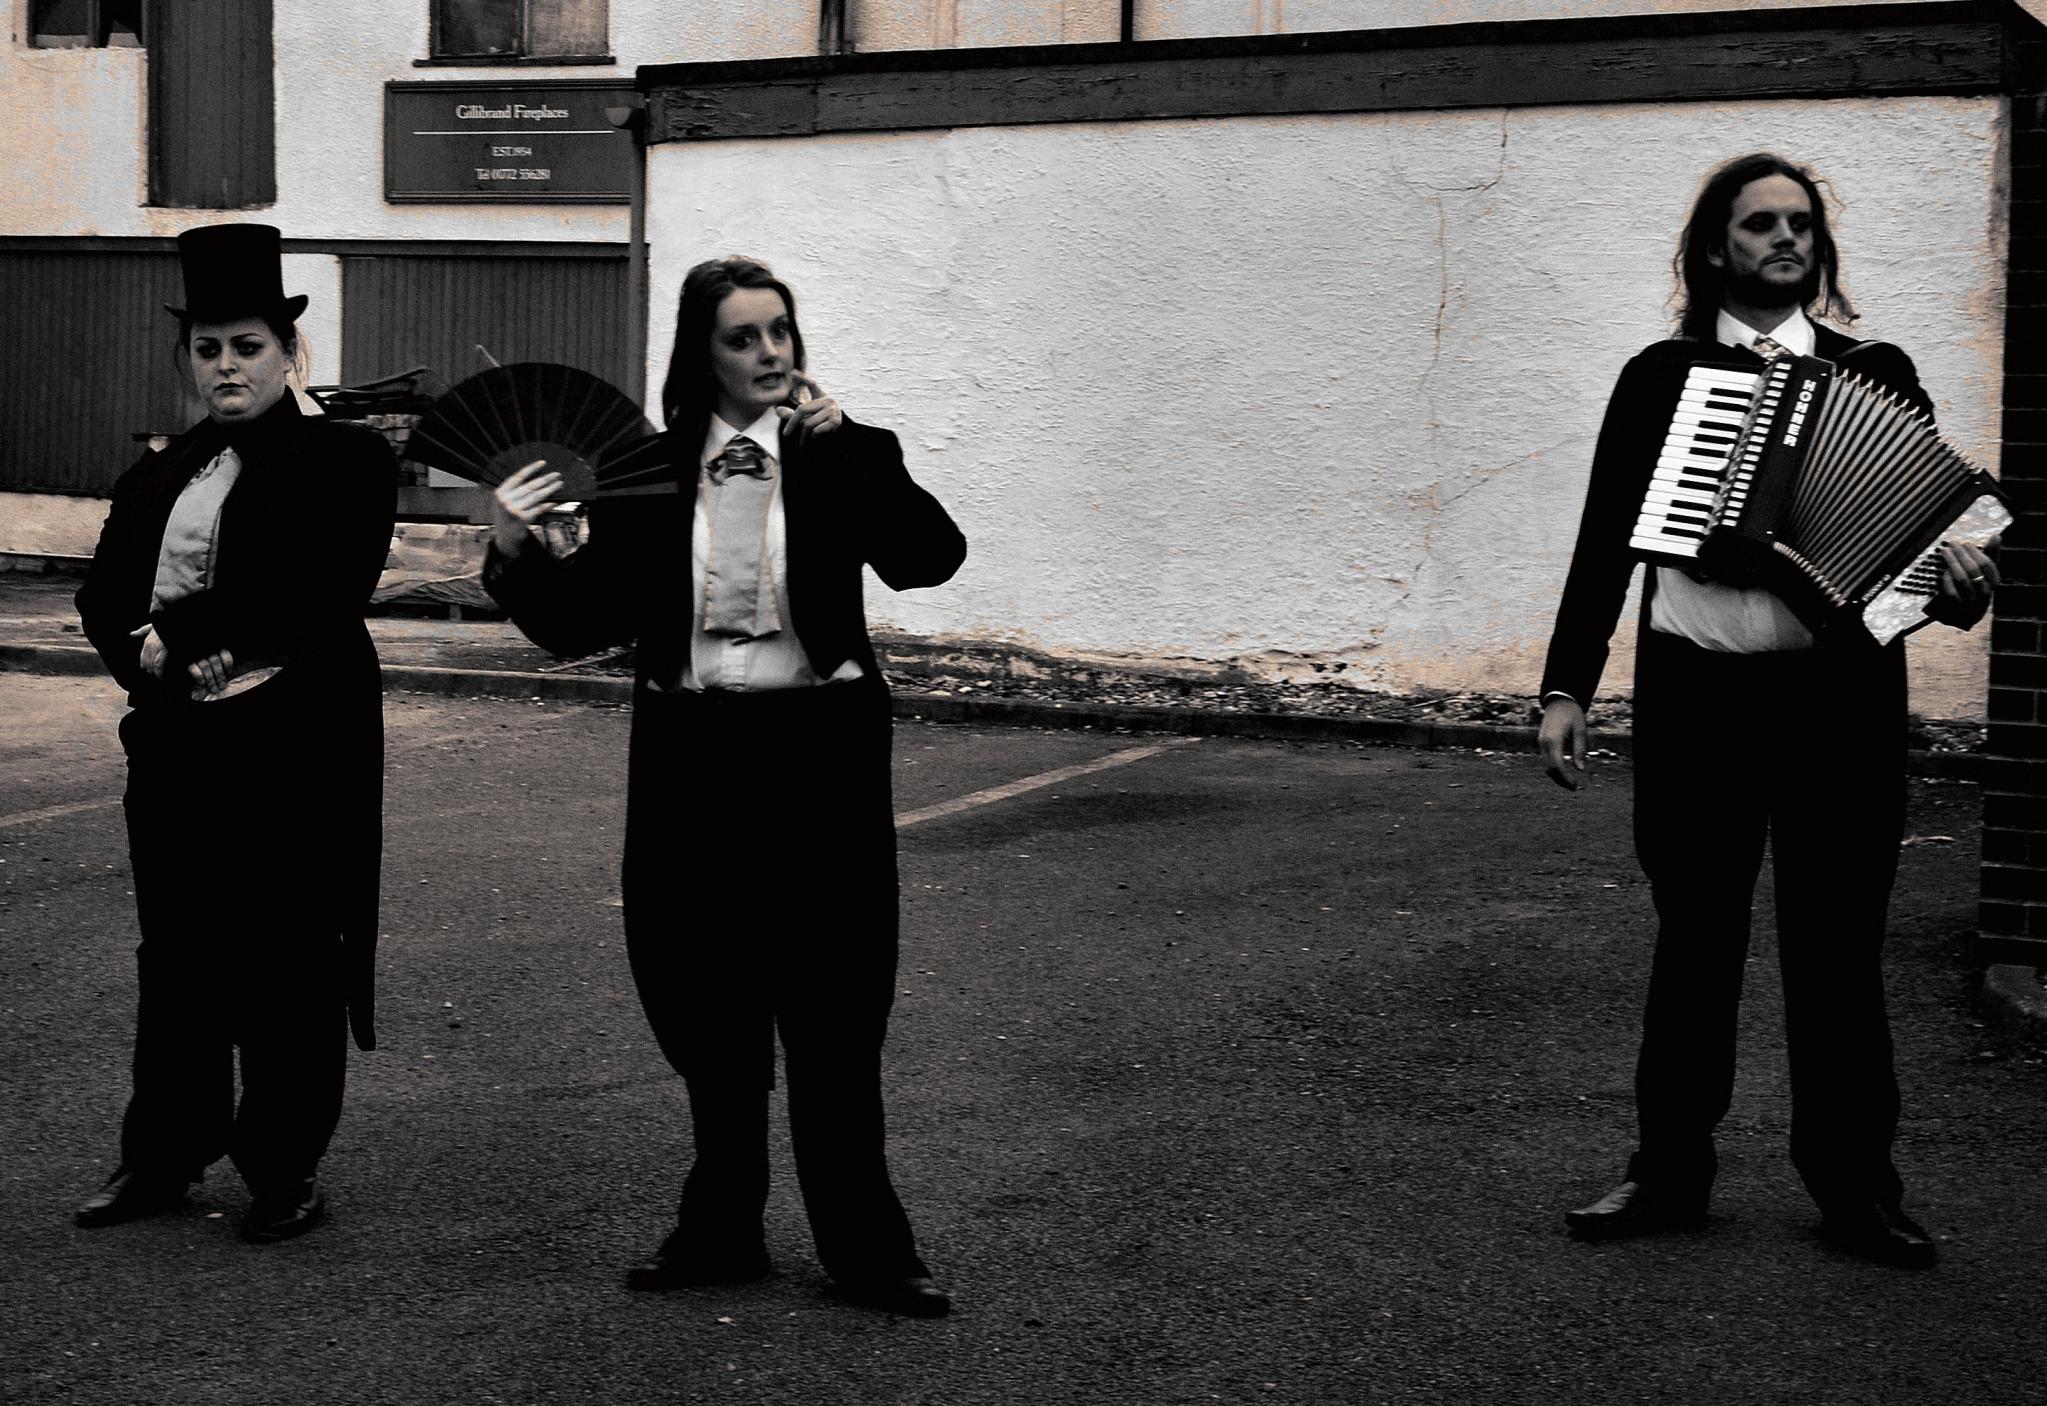 The Wooden Spoon Cut Throat tour in September taking in Preston's murderous past